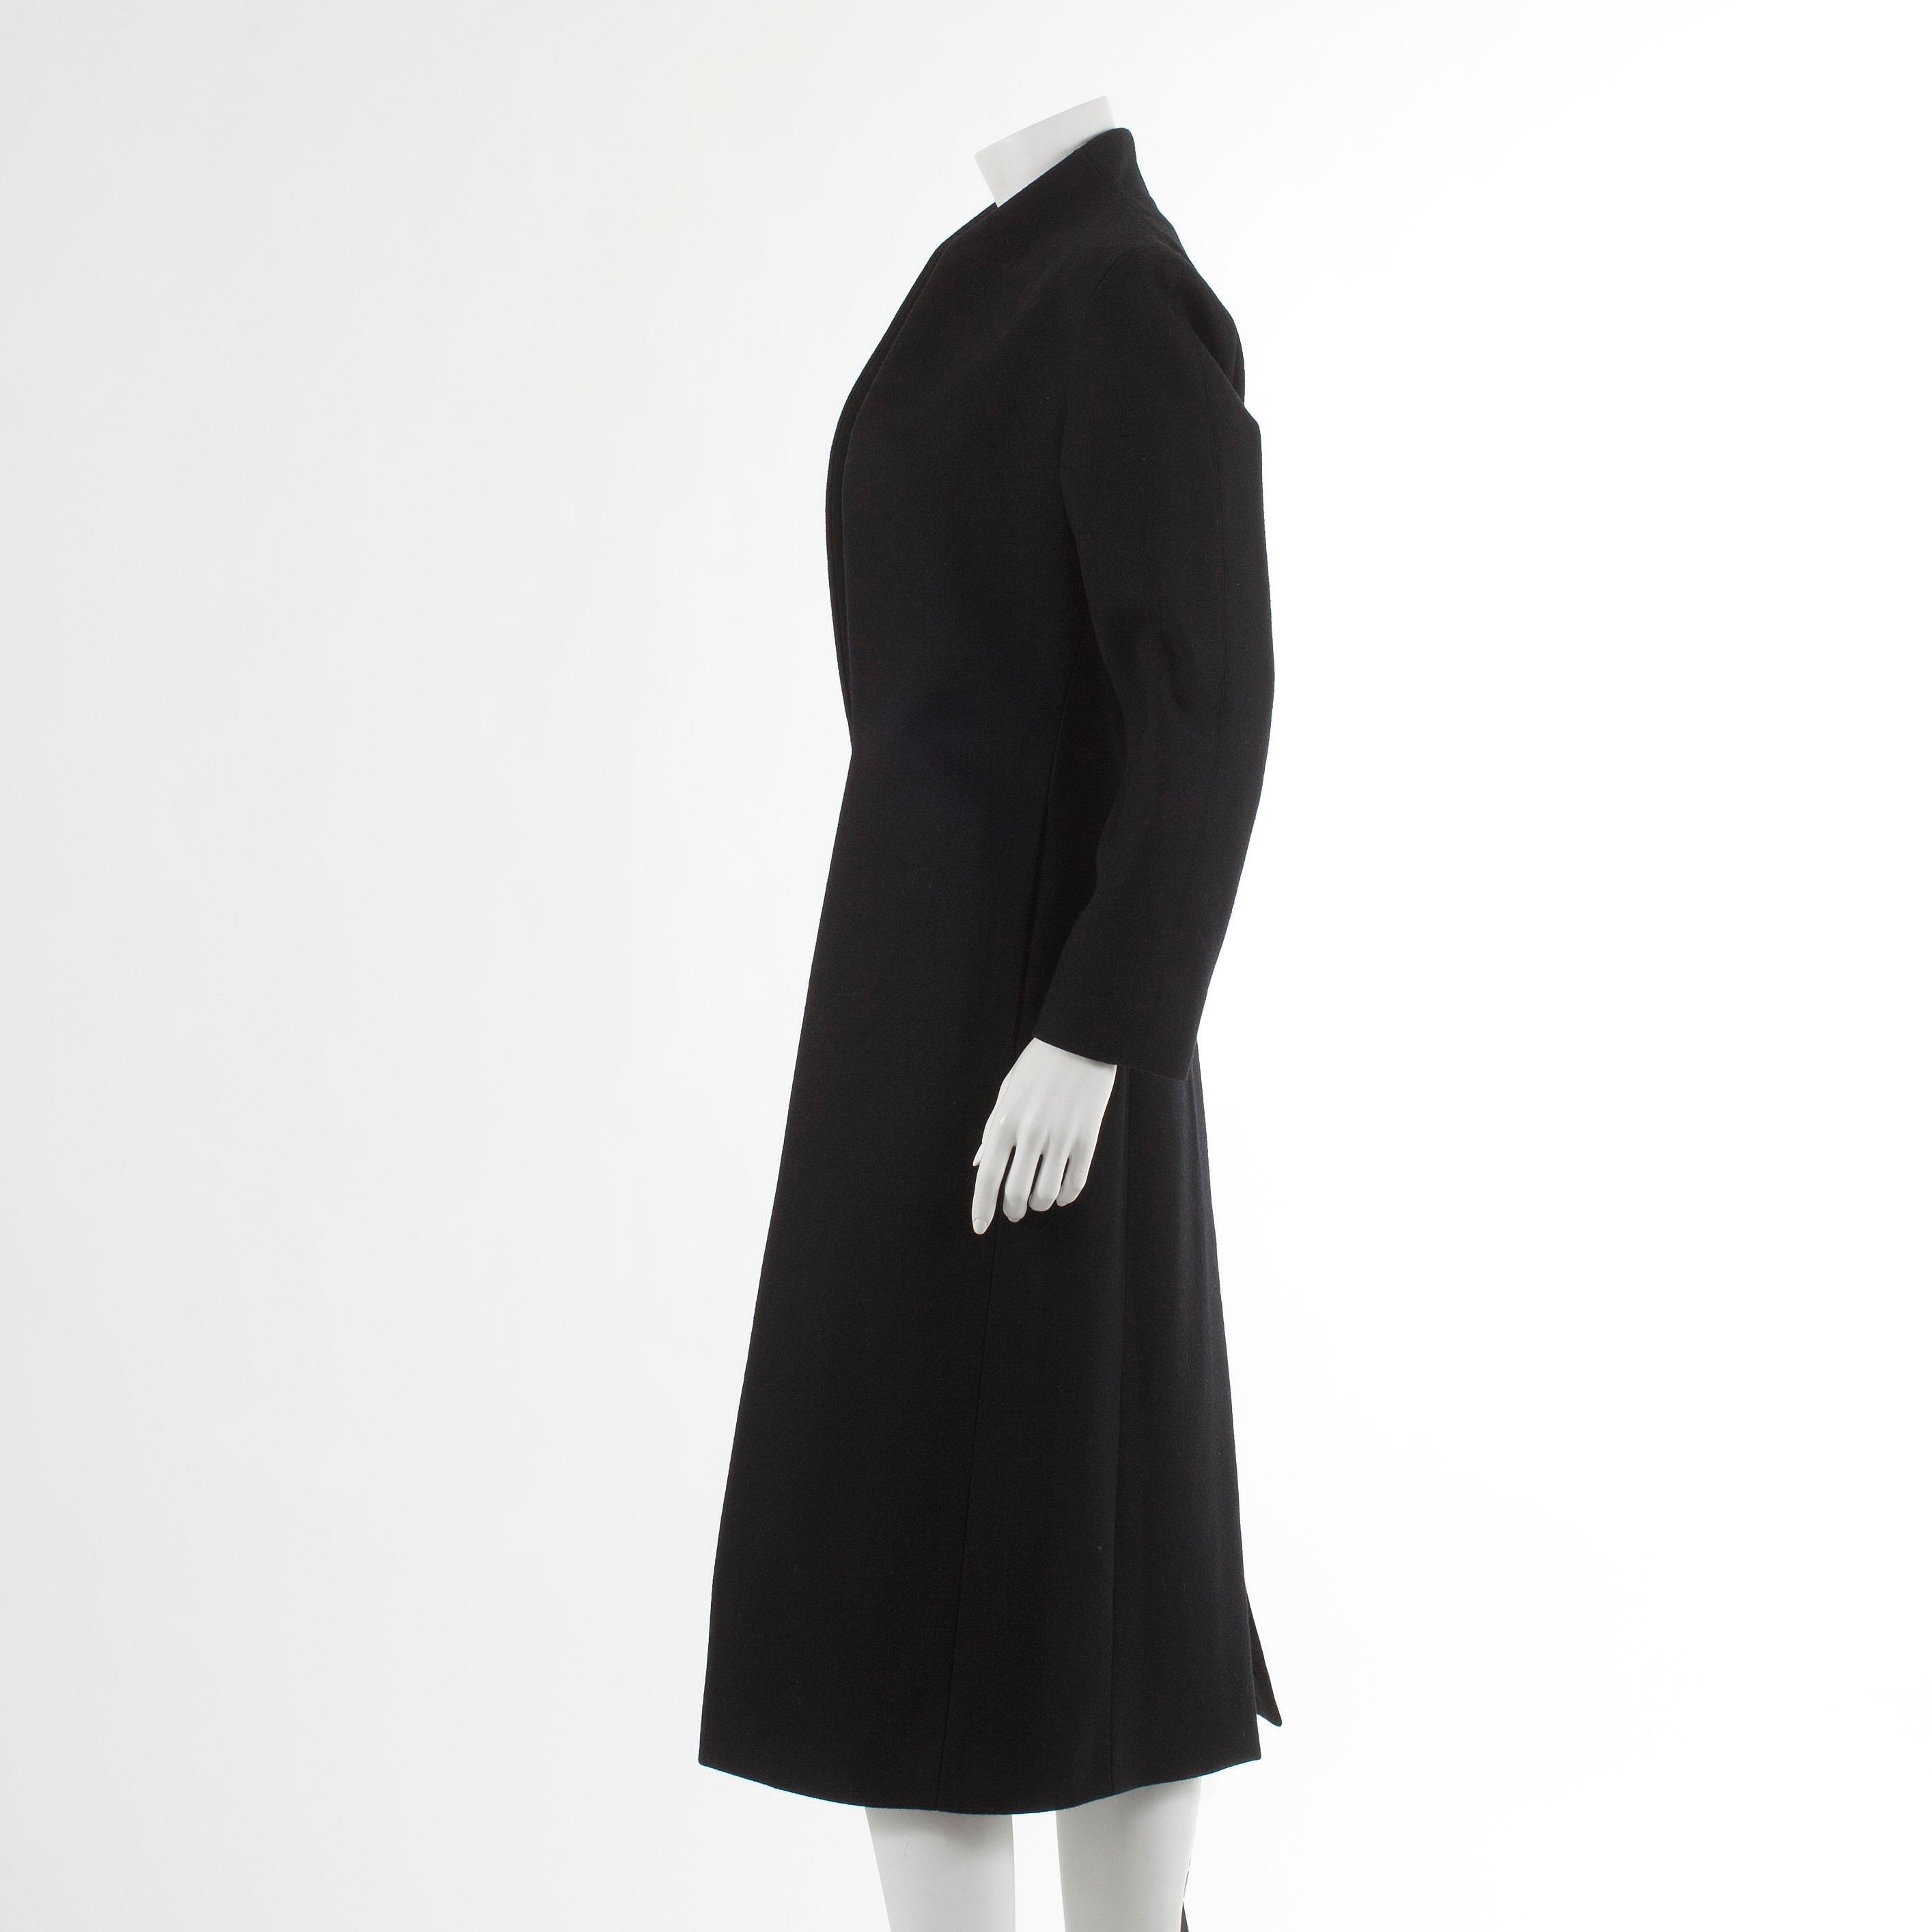 19ccd904e0e YVES SAINT LAURENT, a black wool coat. French size 46. - Bukowskis